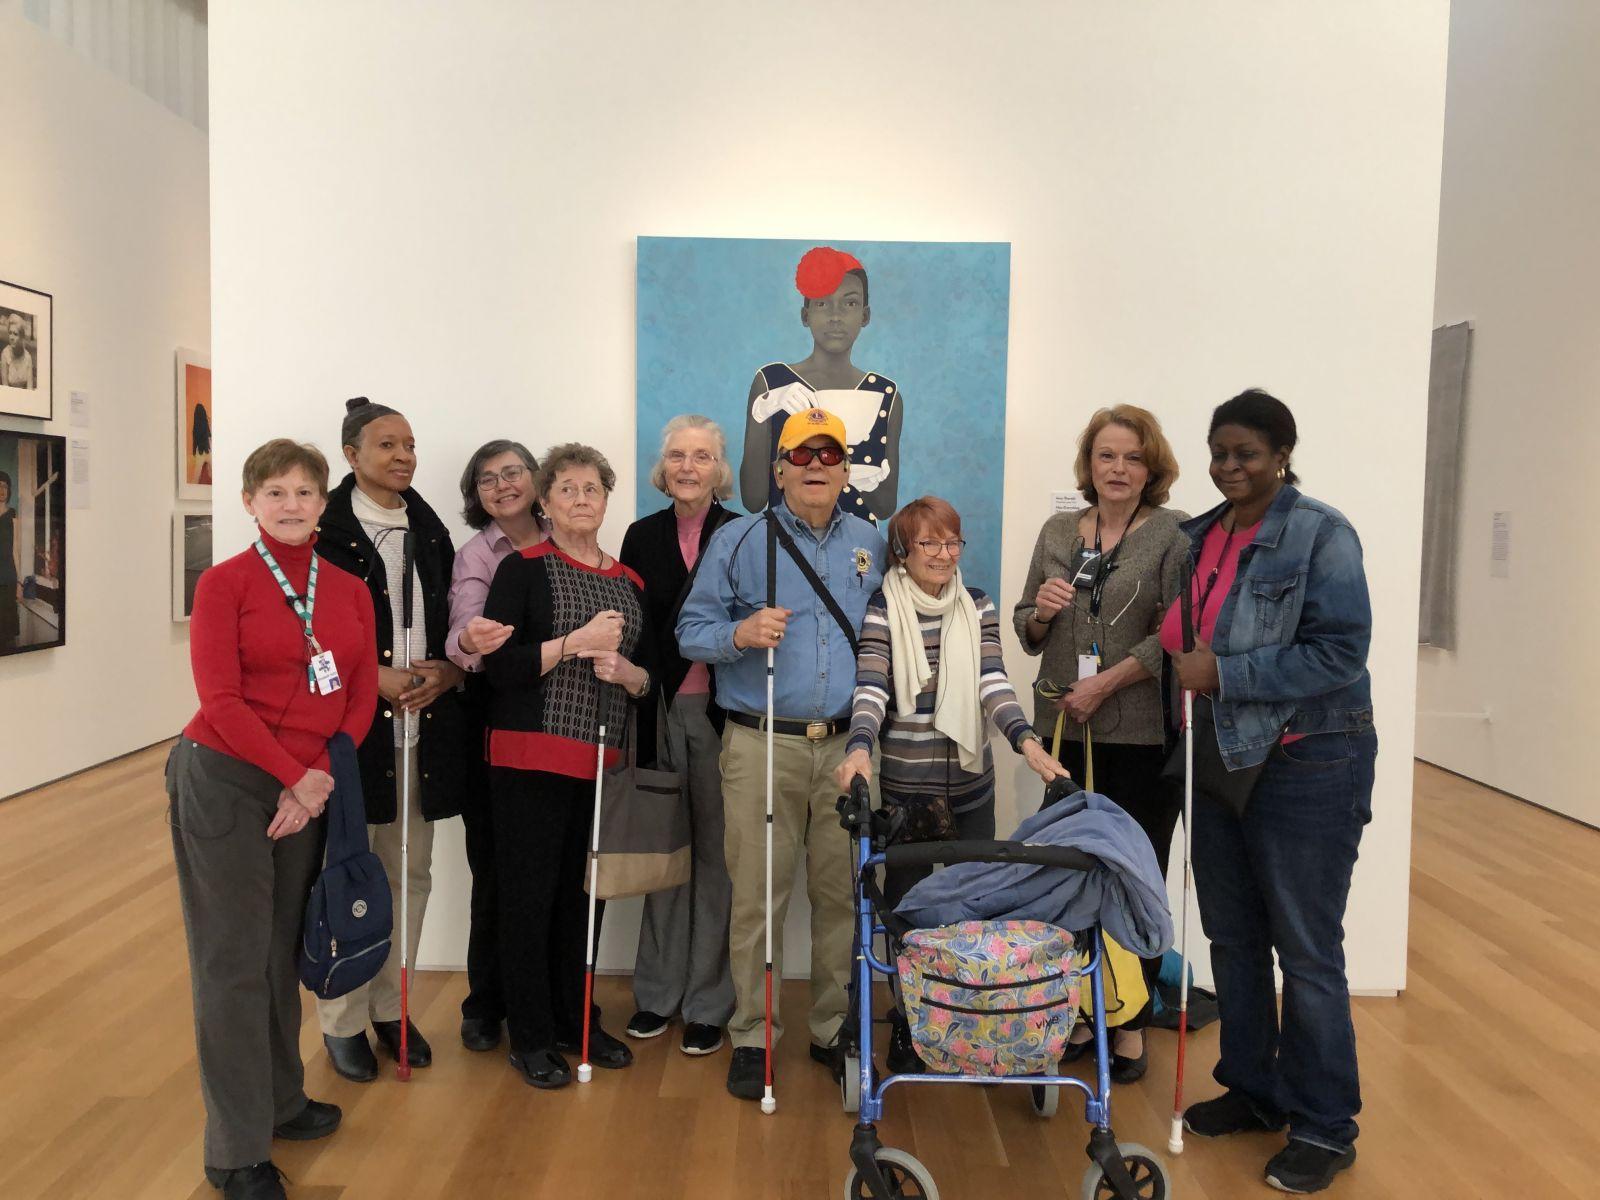 Docent Tour Group at NC Museum of Art L/R:  Elizabeth Kahn, Jo Anne King, Beth McGuire, Susan McKay, Lion Dale Graham, Lion Bill Graham, Diana Cook, Donna King & Lion Karyn Hampton